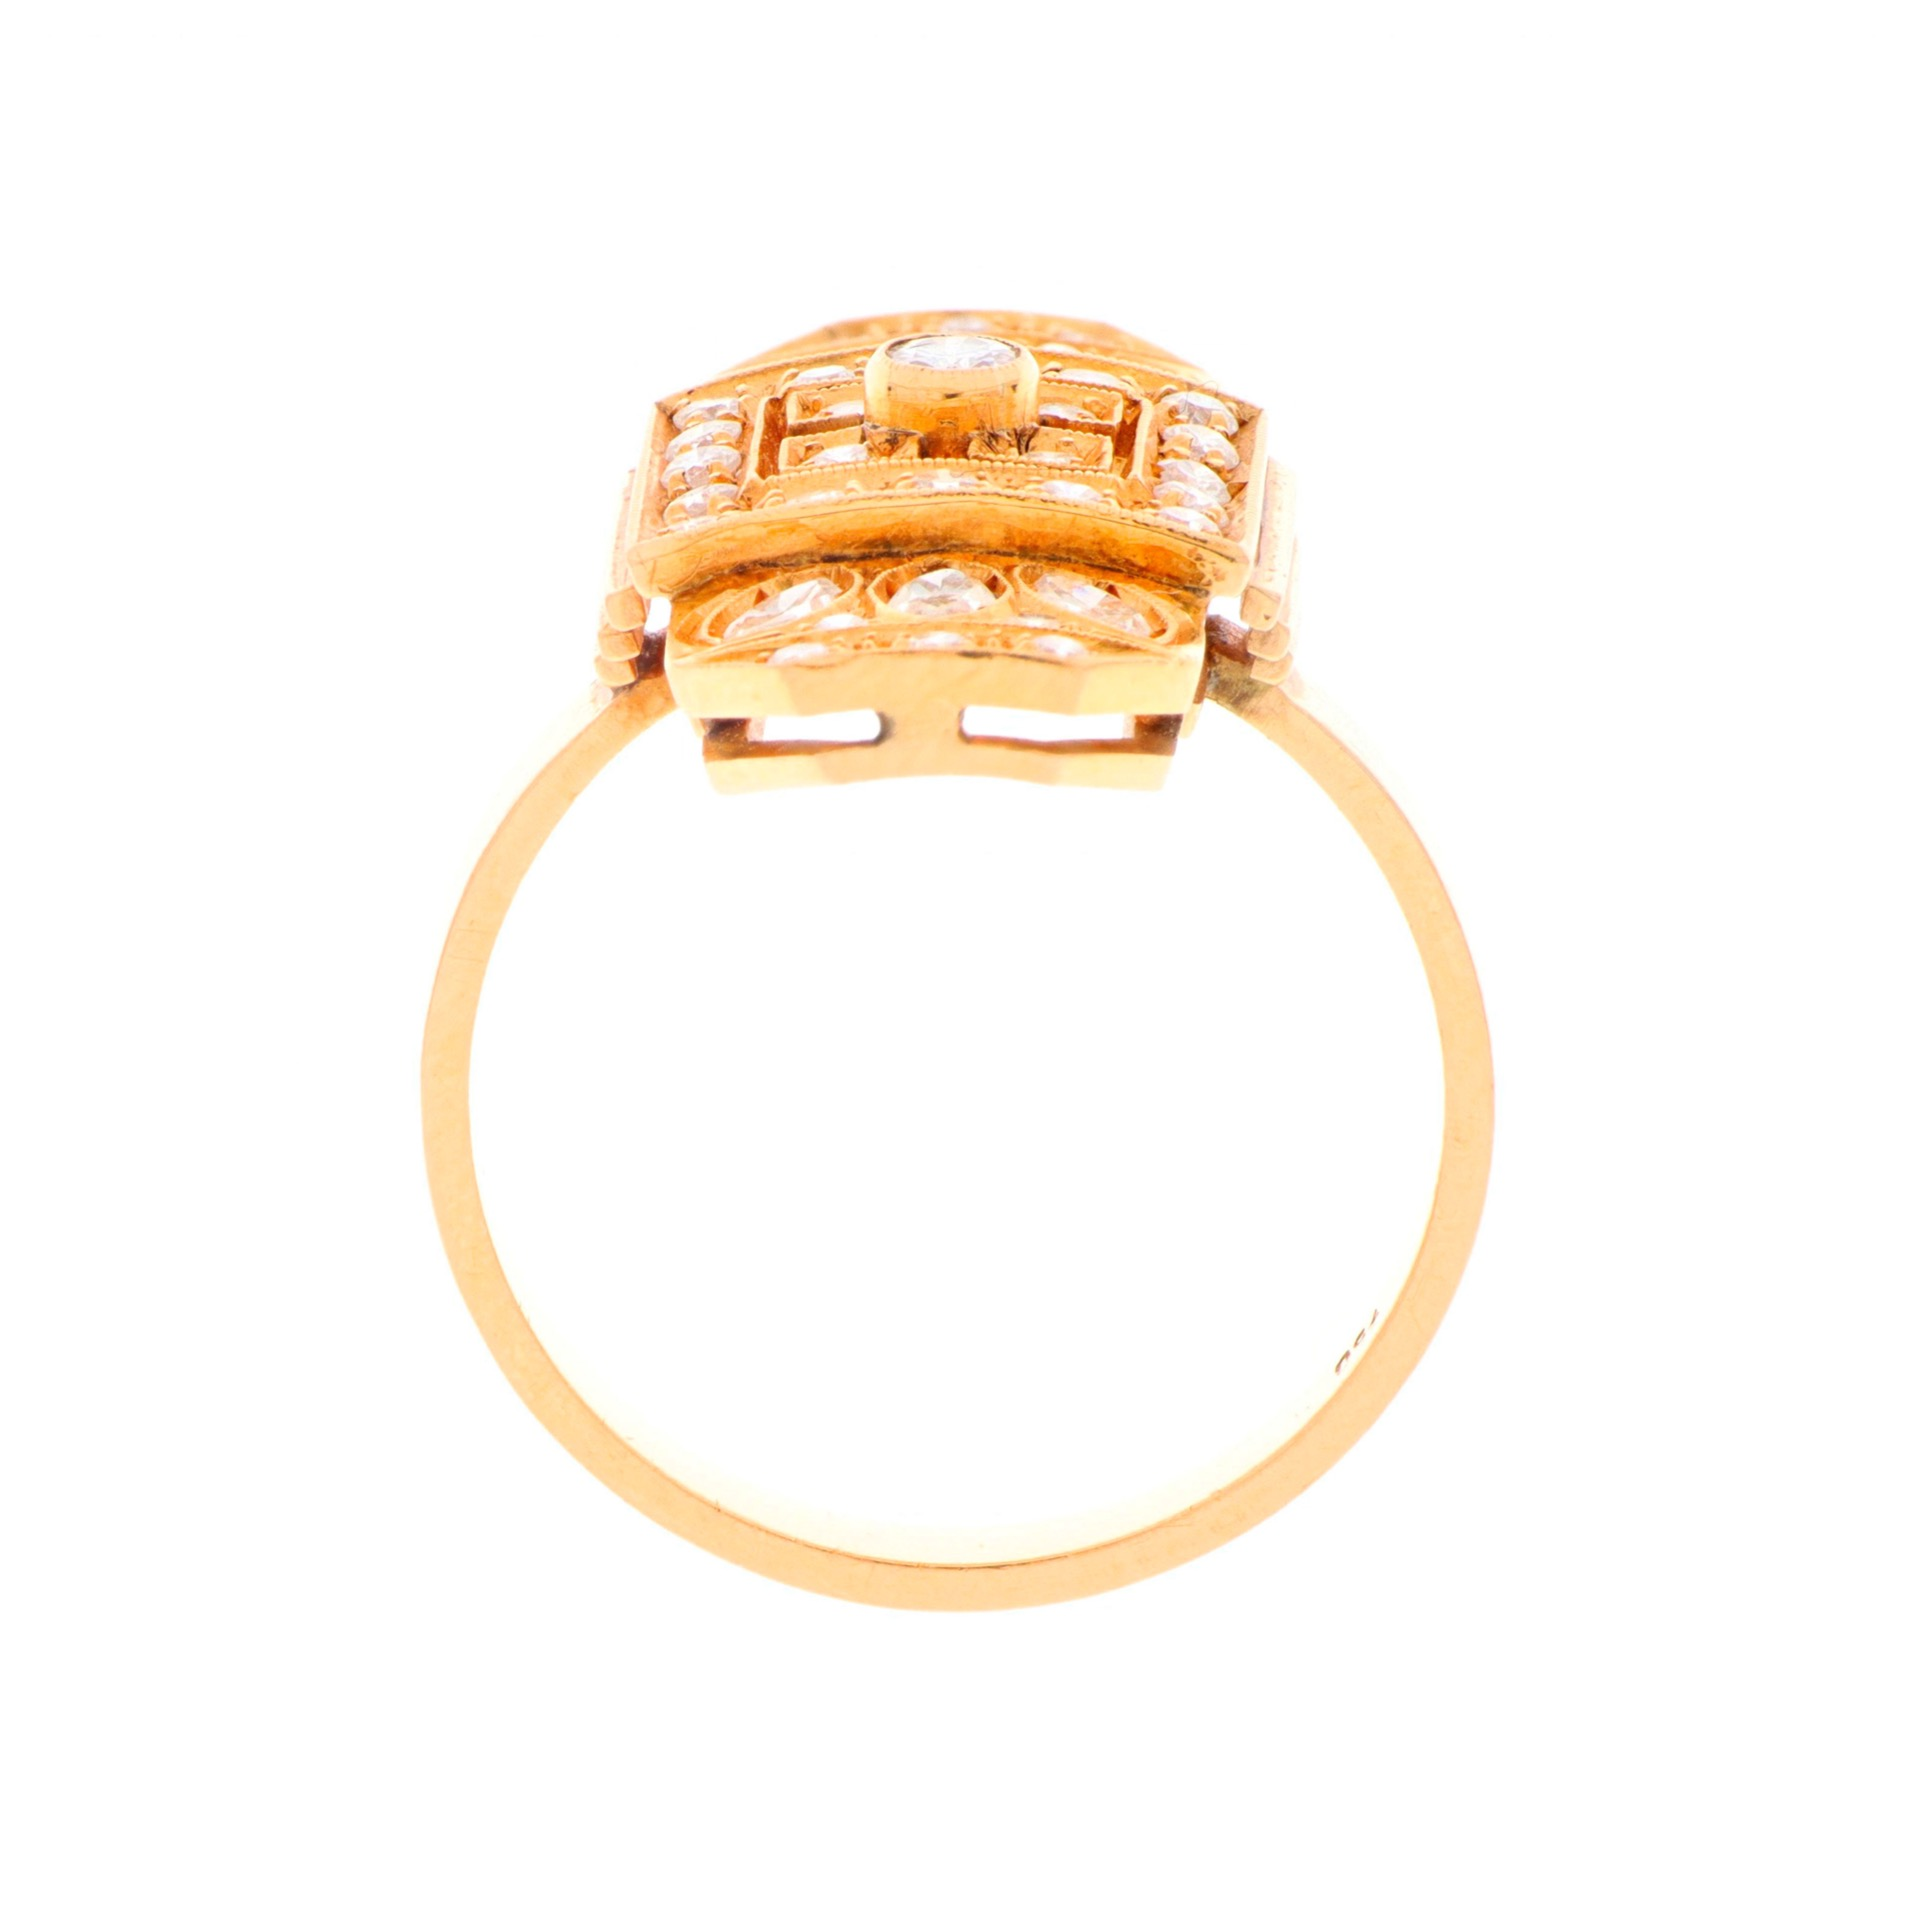 thumb3|Anello in oro giallo con diamanti